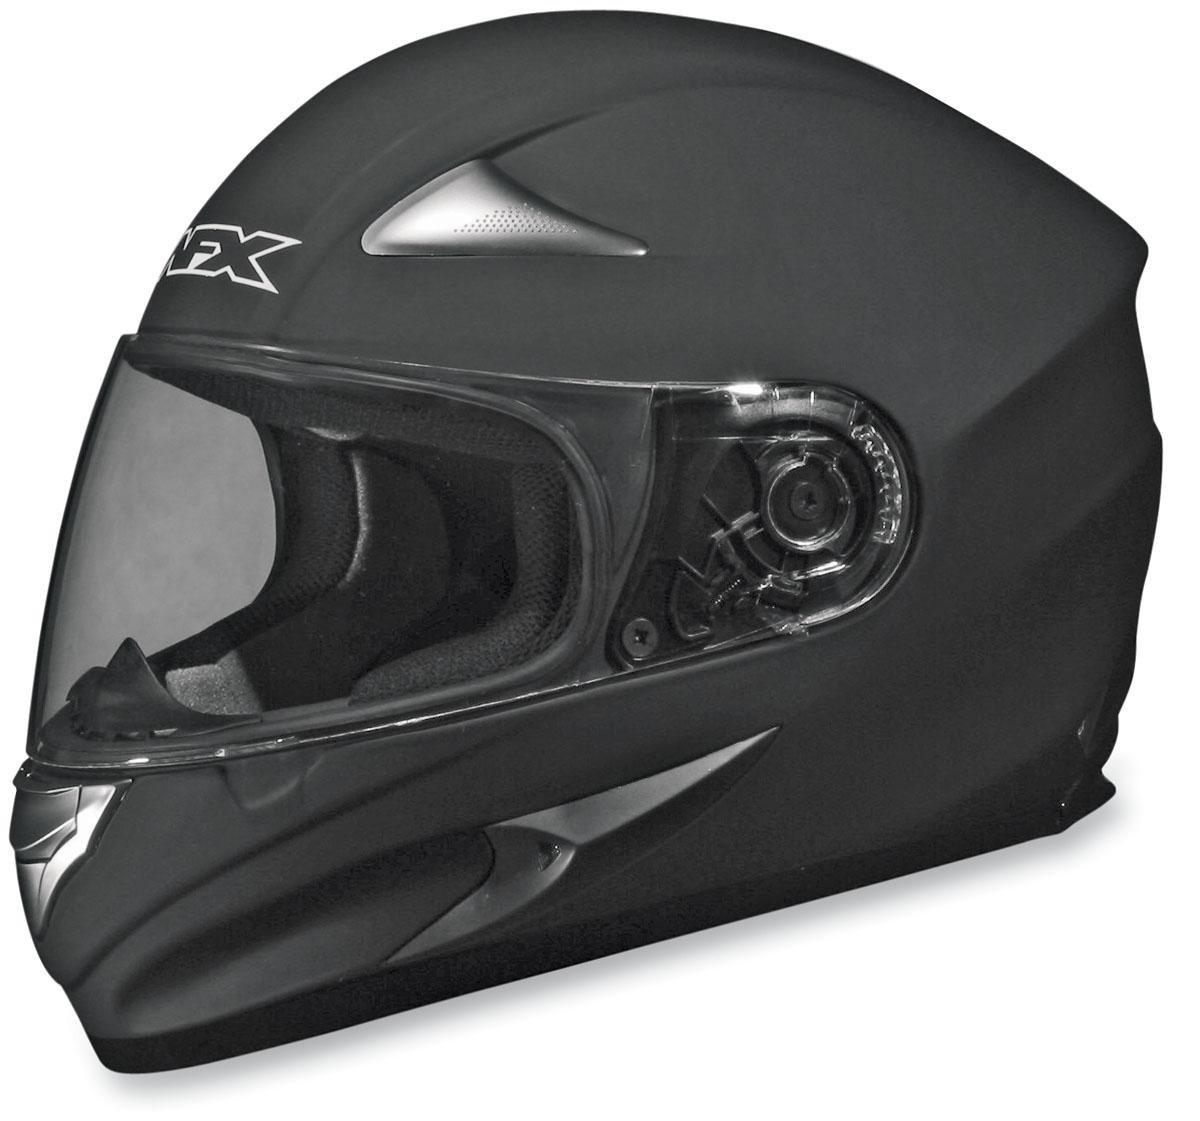 Gender: Mens//Unisex Size: Md Helmet Category: Street 0101-3345 Primary Color: Black AFX FX-90 Solid Helmet Helmet Type: Full-face Helmets Distinct Name: Flat Black